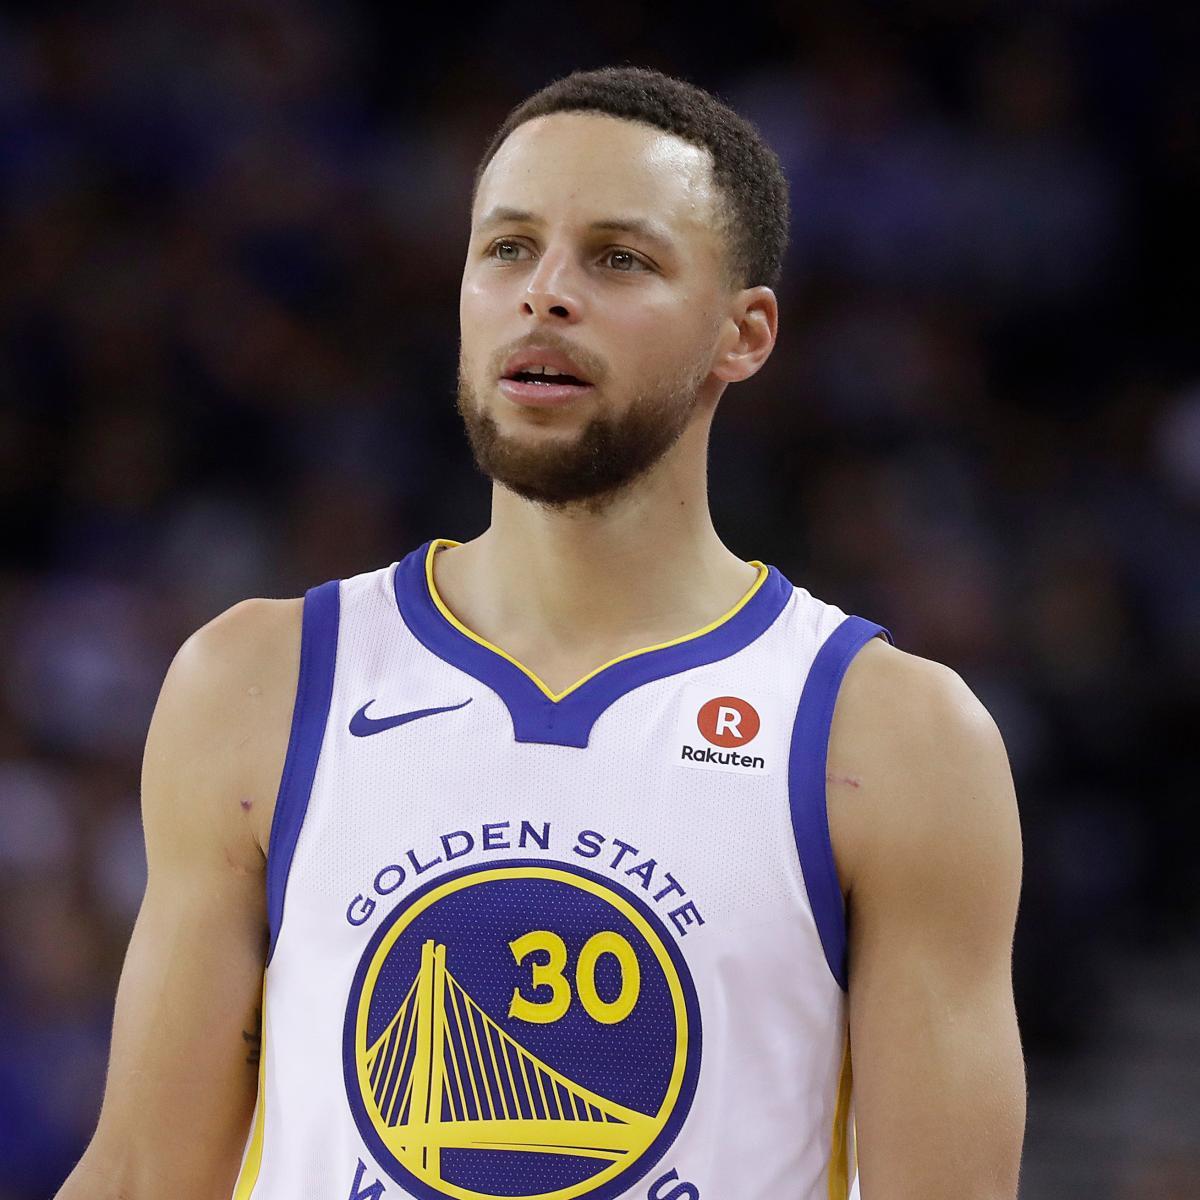 Warriors Movie Clips: Stephen Curry Crash Video Shows Car Hitting Warriors Star